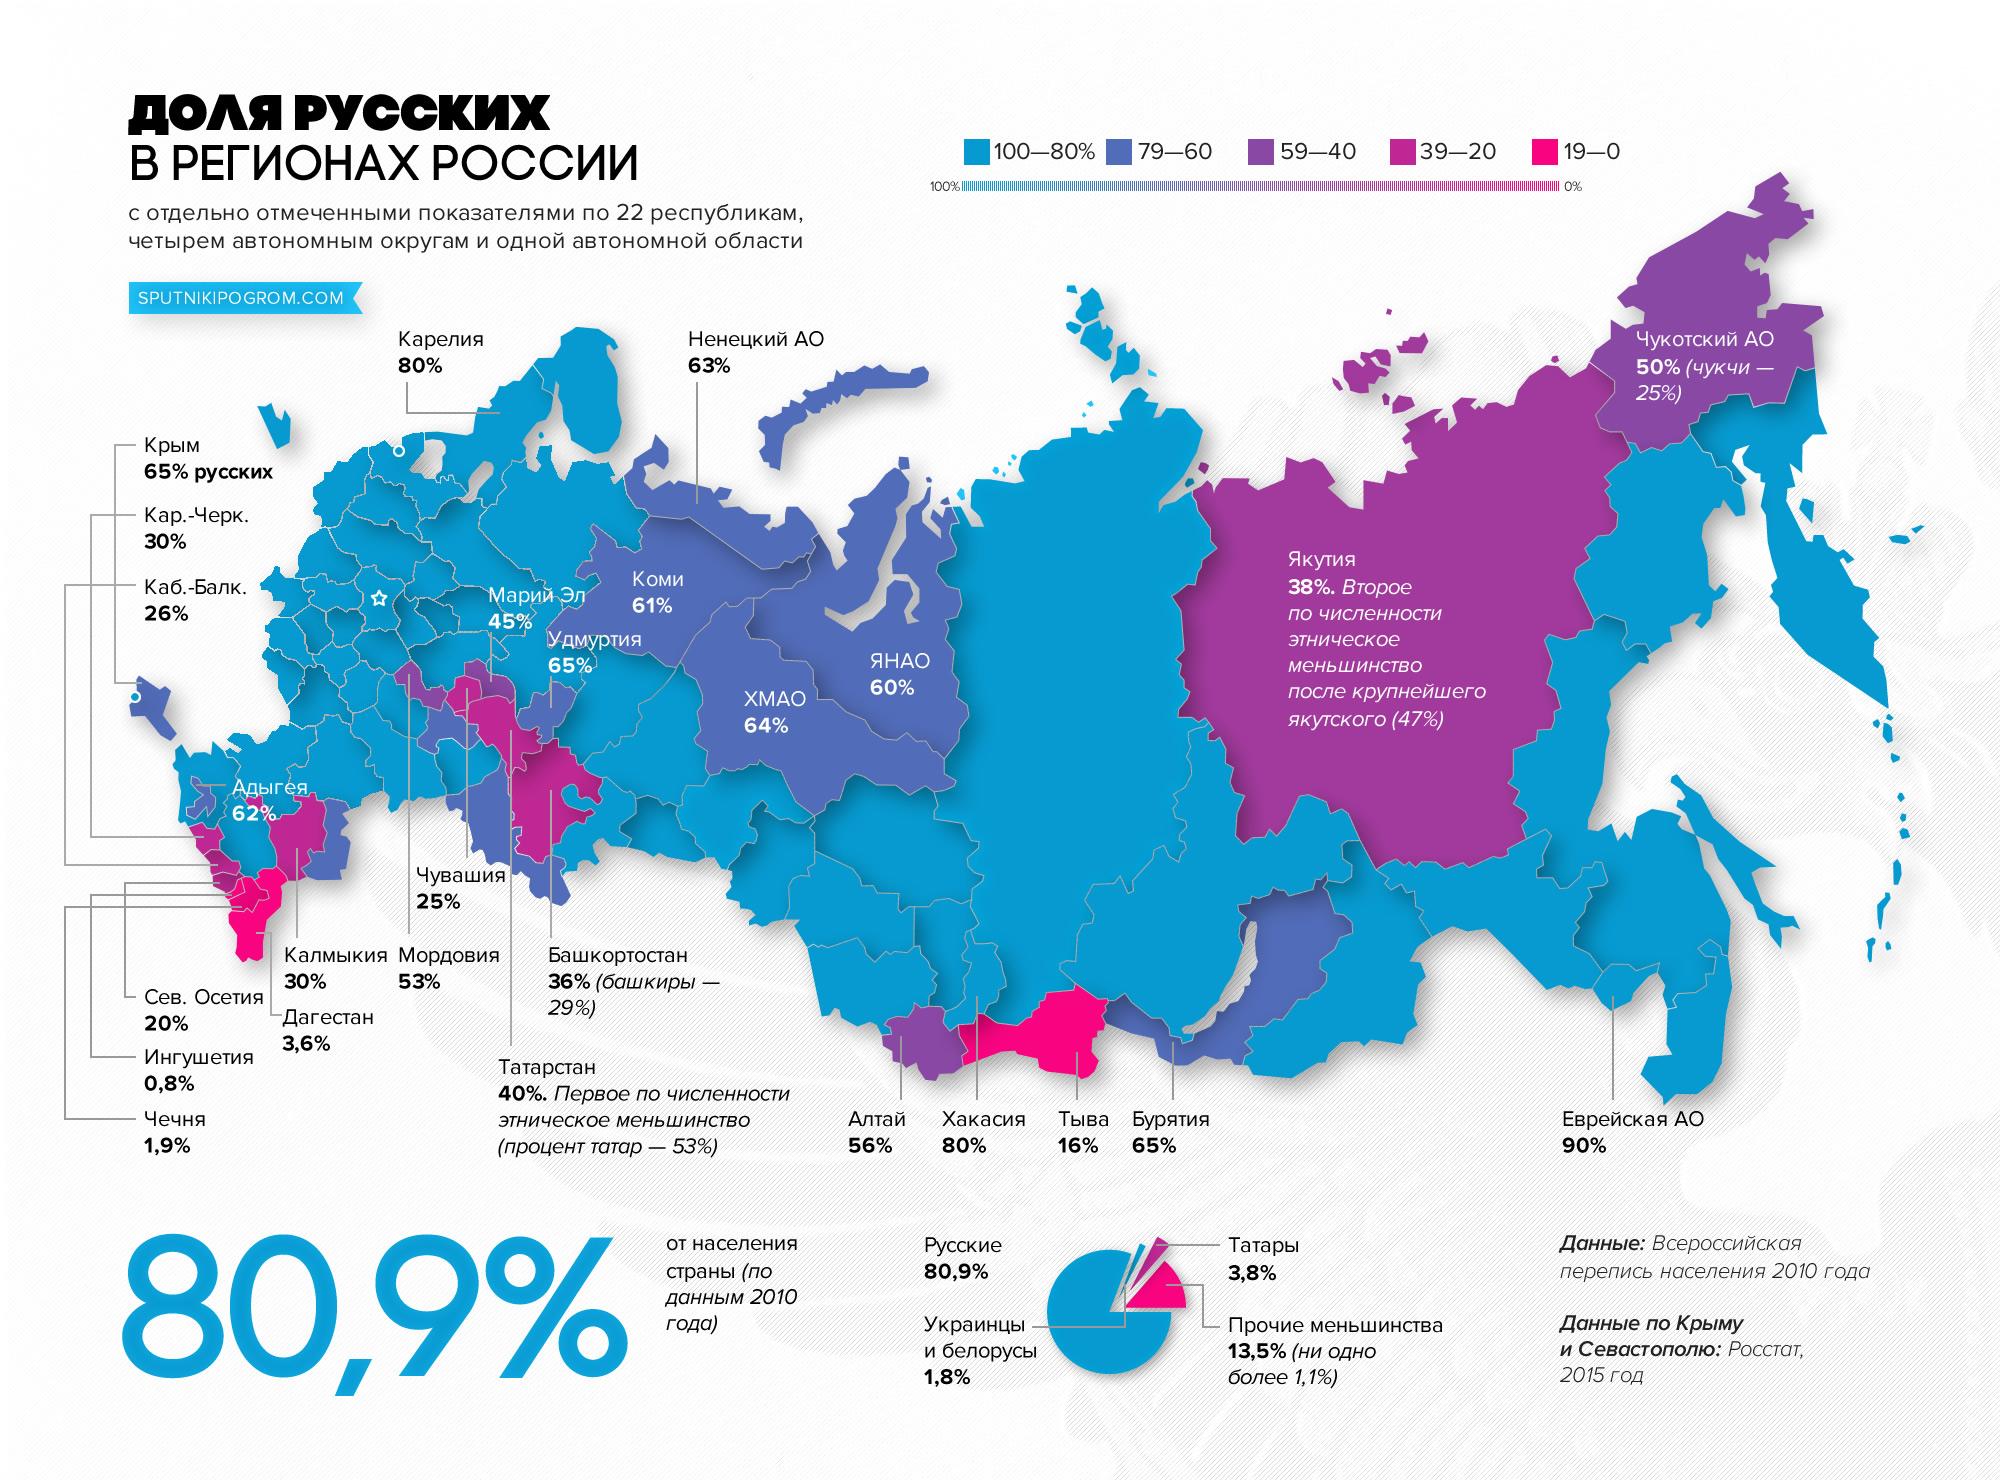 А кто такие русские? Russia0x